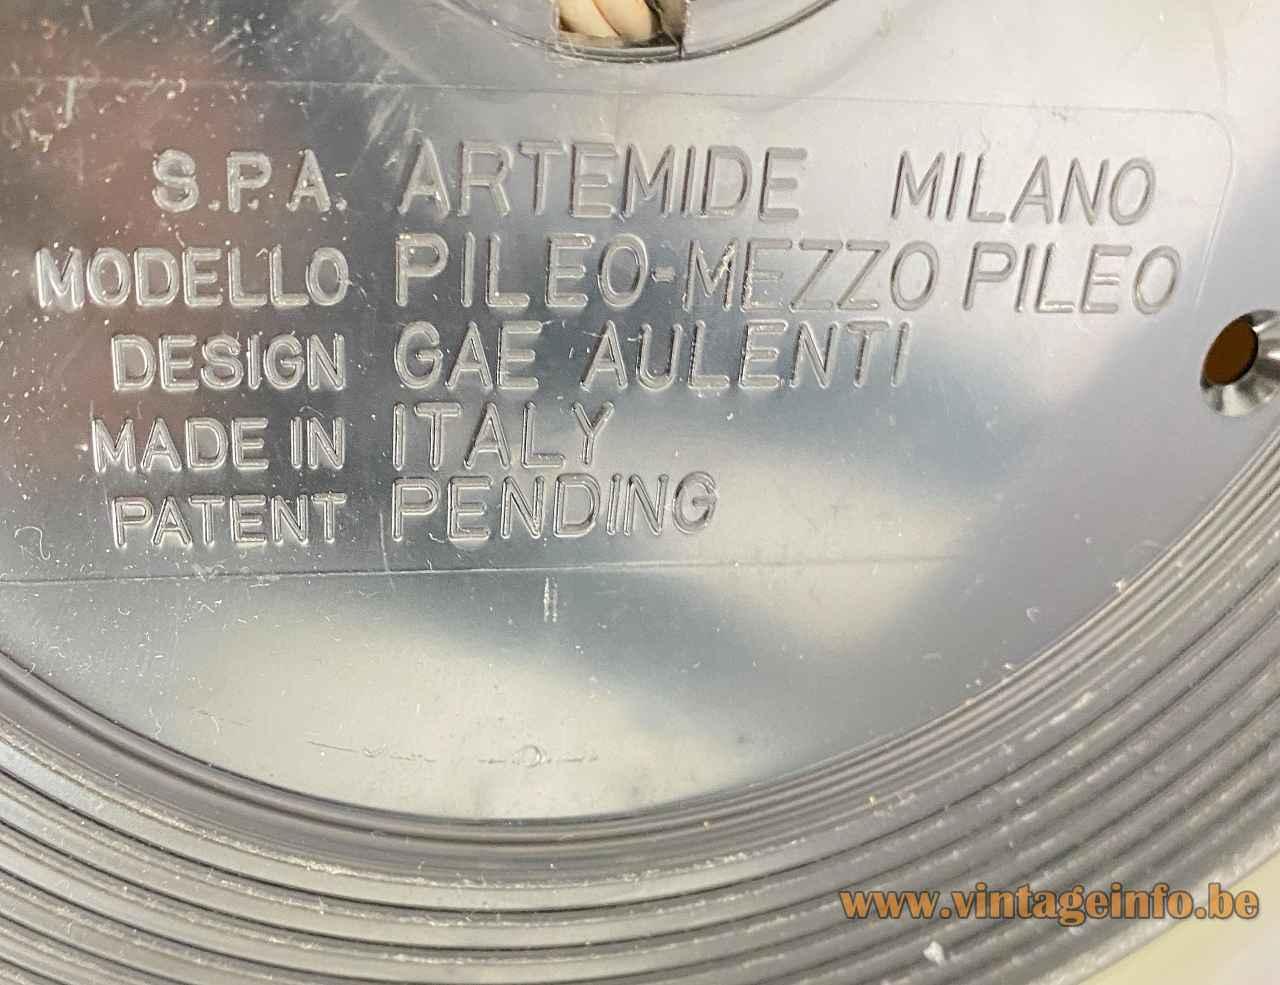 Gae Aulenti Artemide Mezzopileo table lamp round black plastic bottom label logo Pileo 1970s Italy